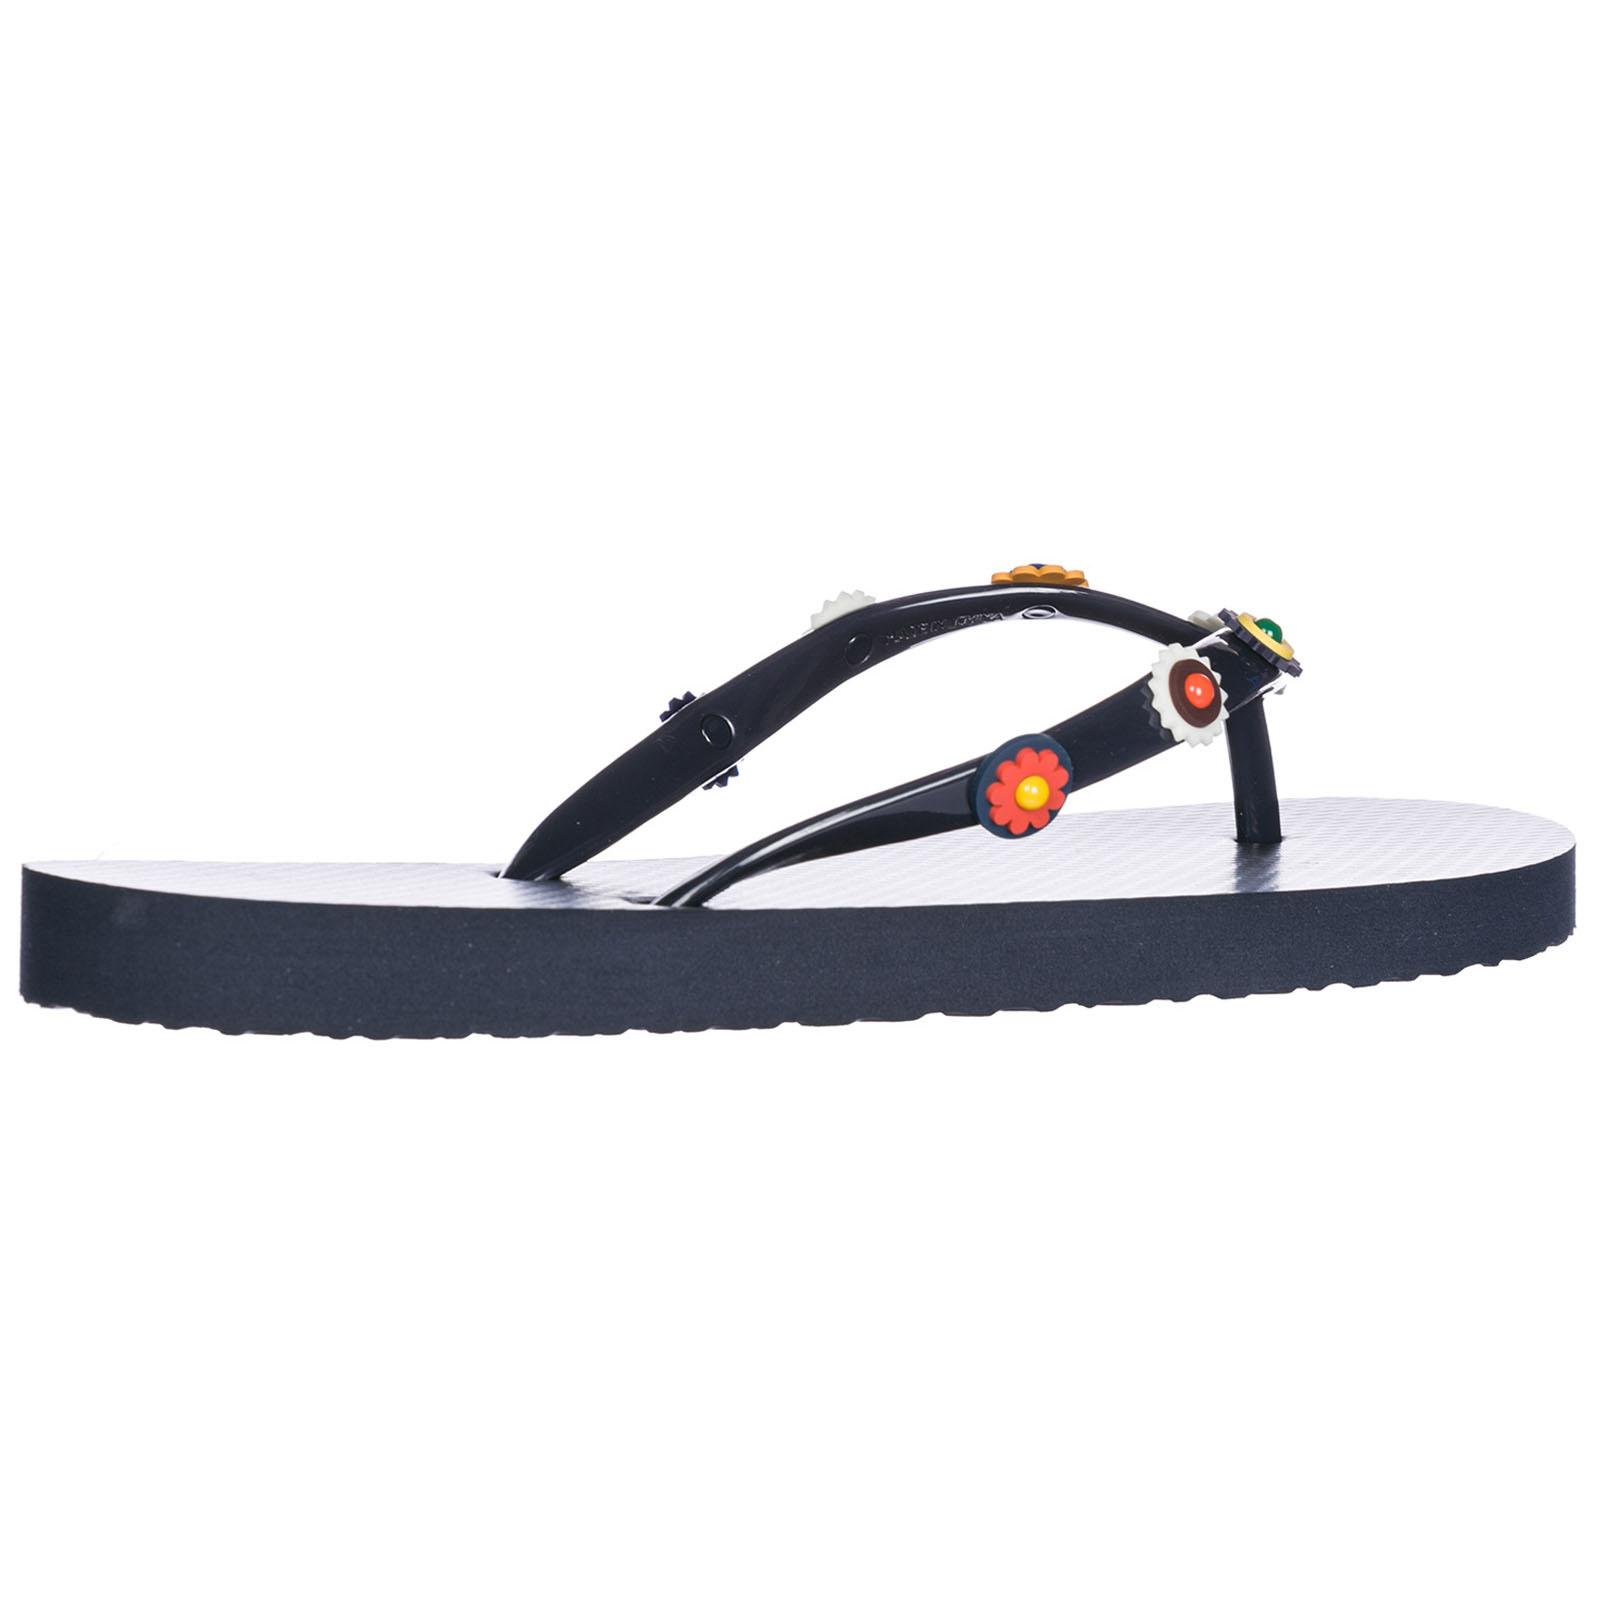 f2506b25aa22 ... Women s rubber flip flops sandals marguerite ...